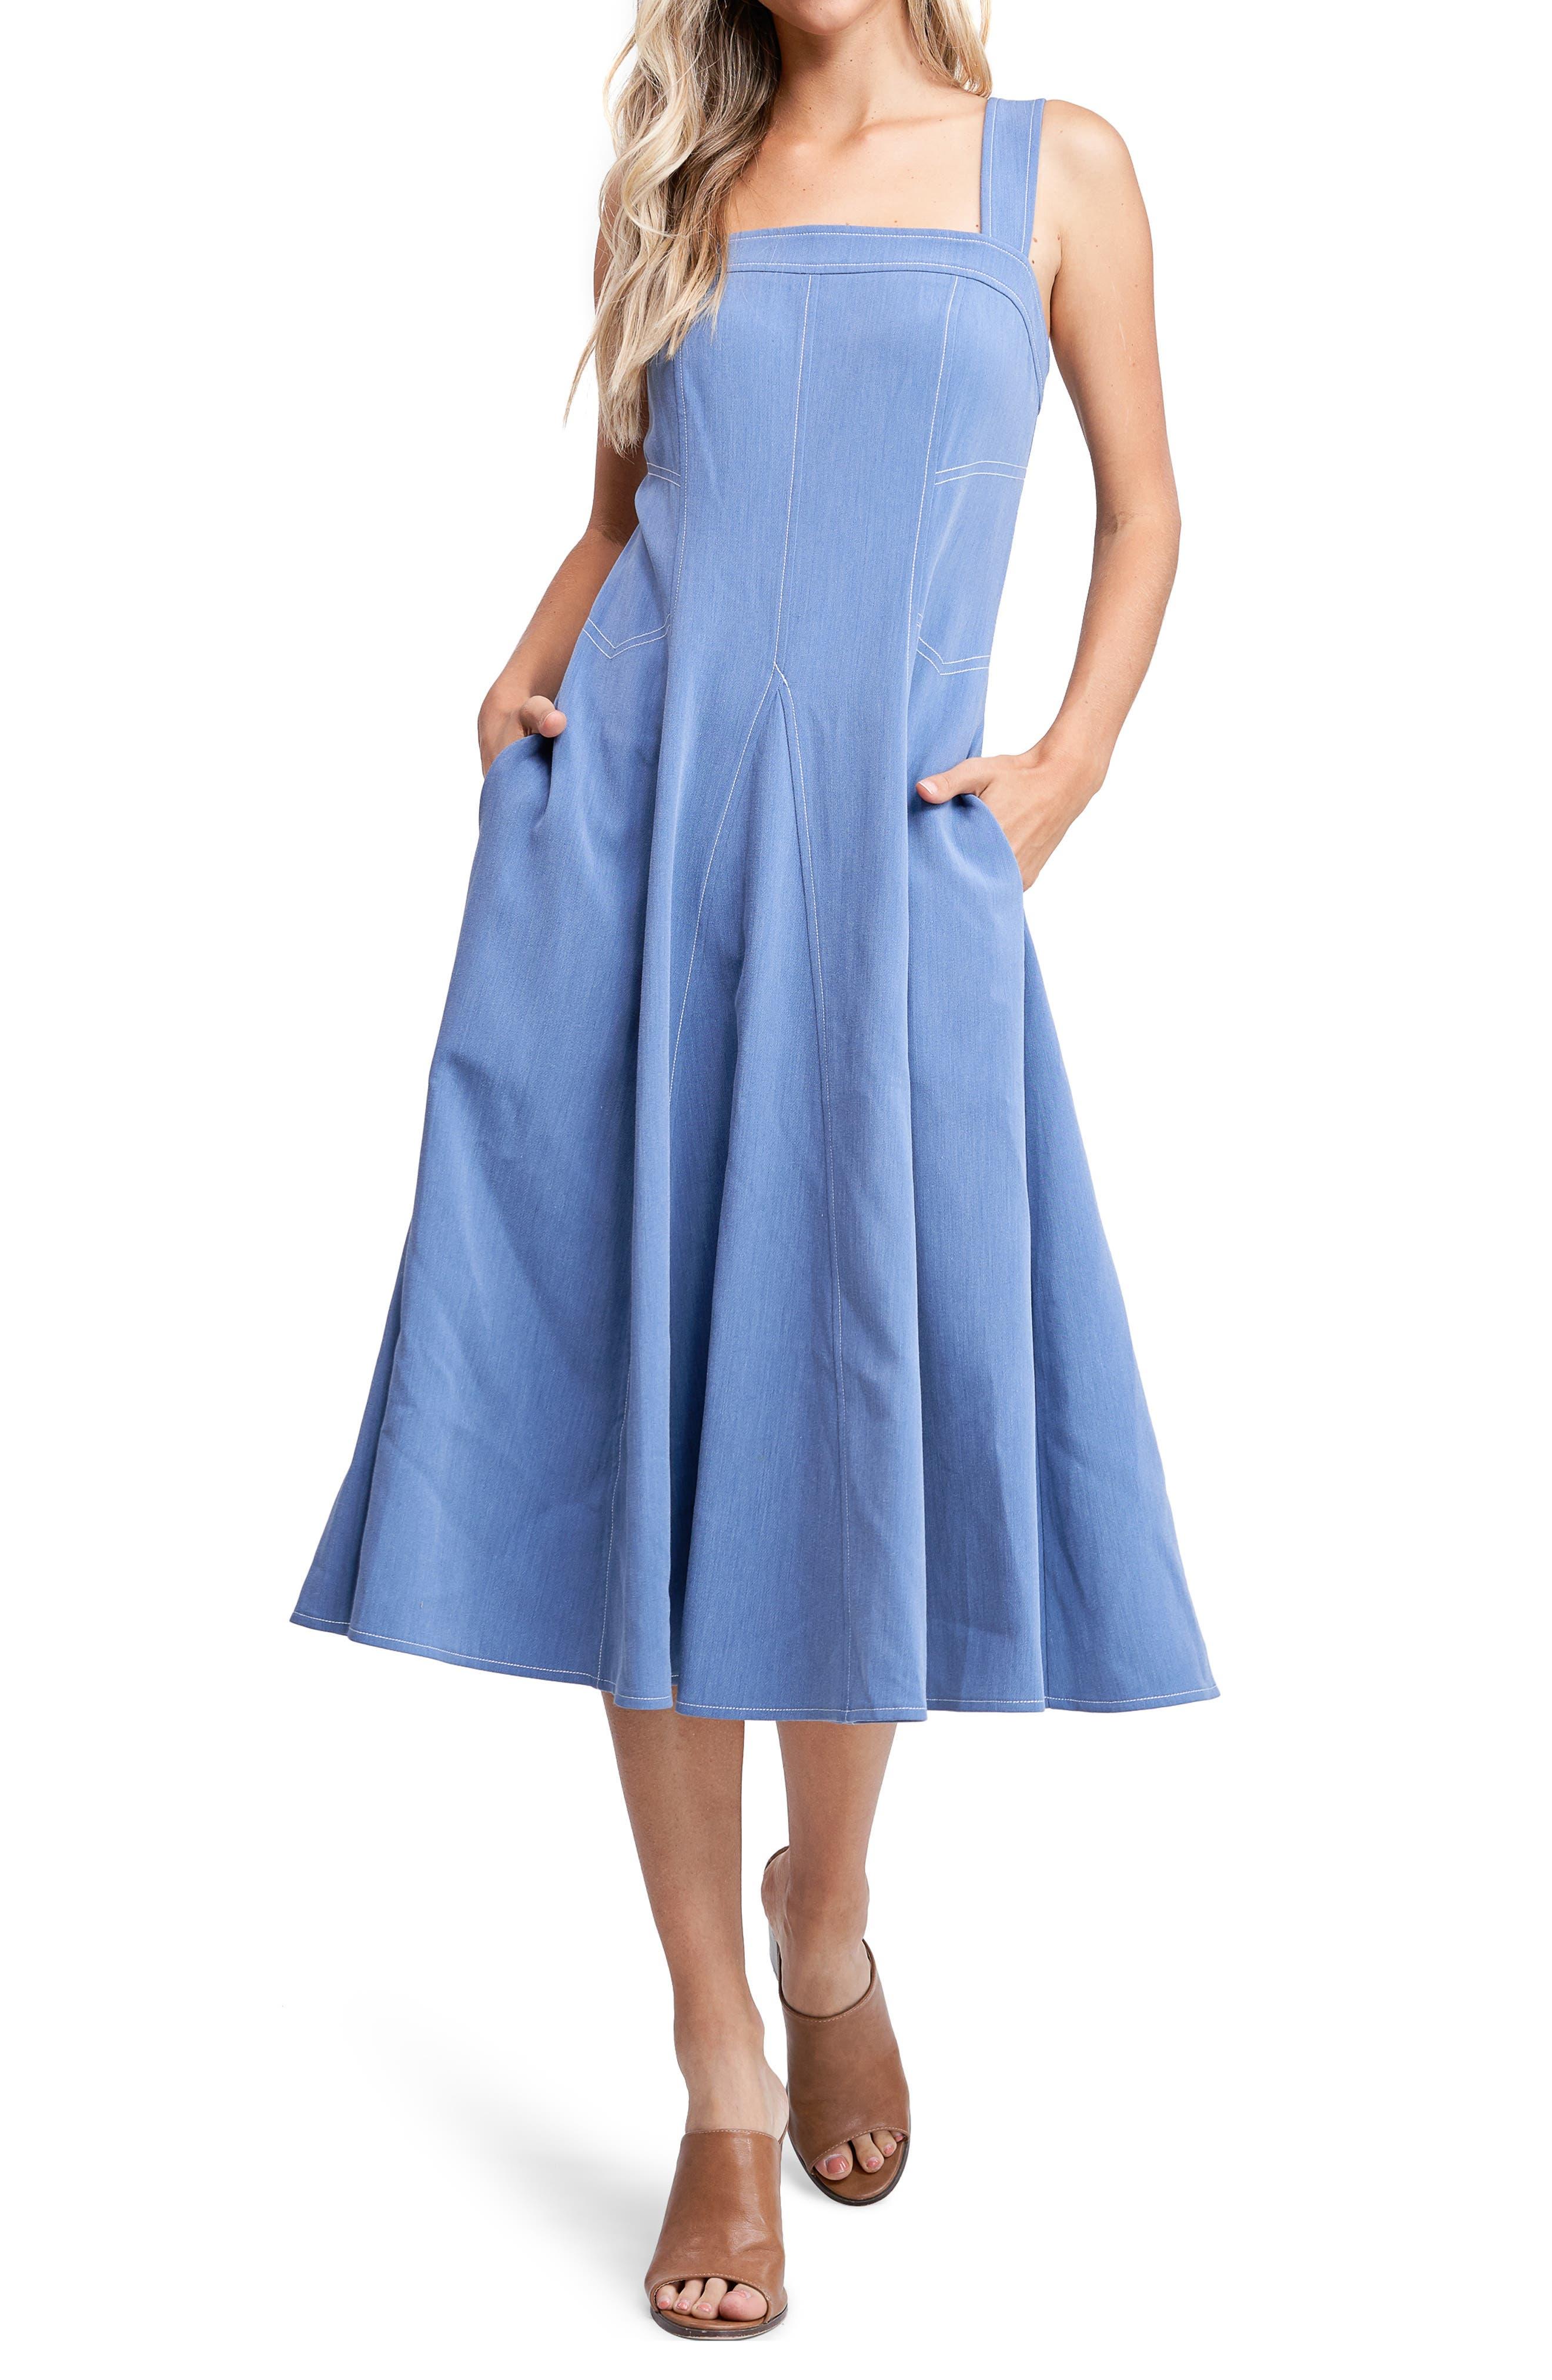 Contrast Stitch Midi Dress